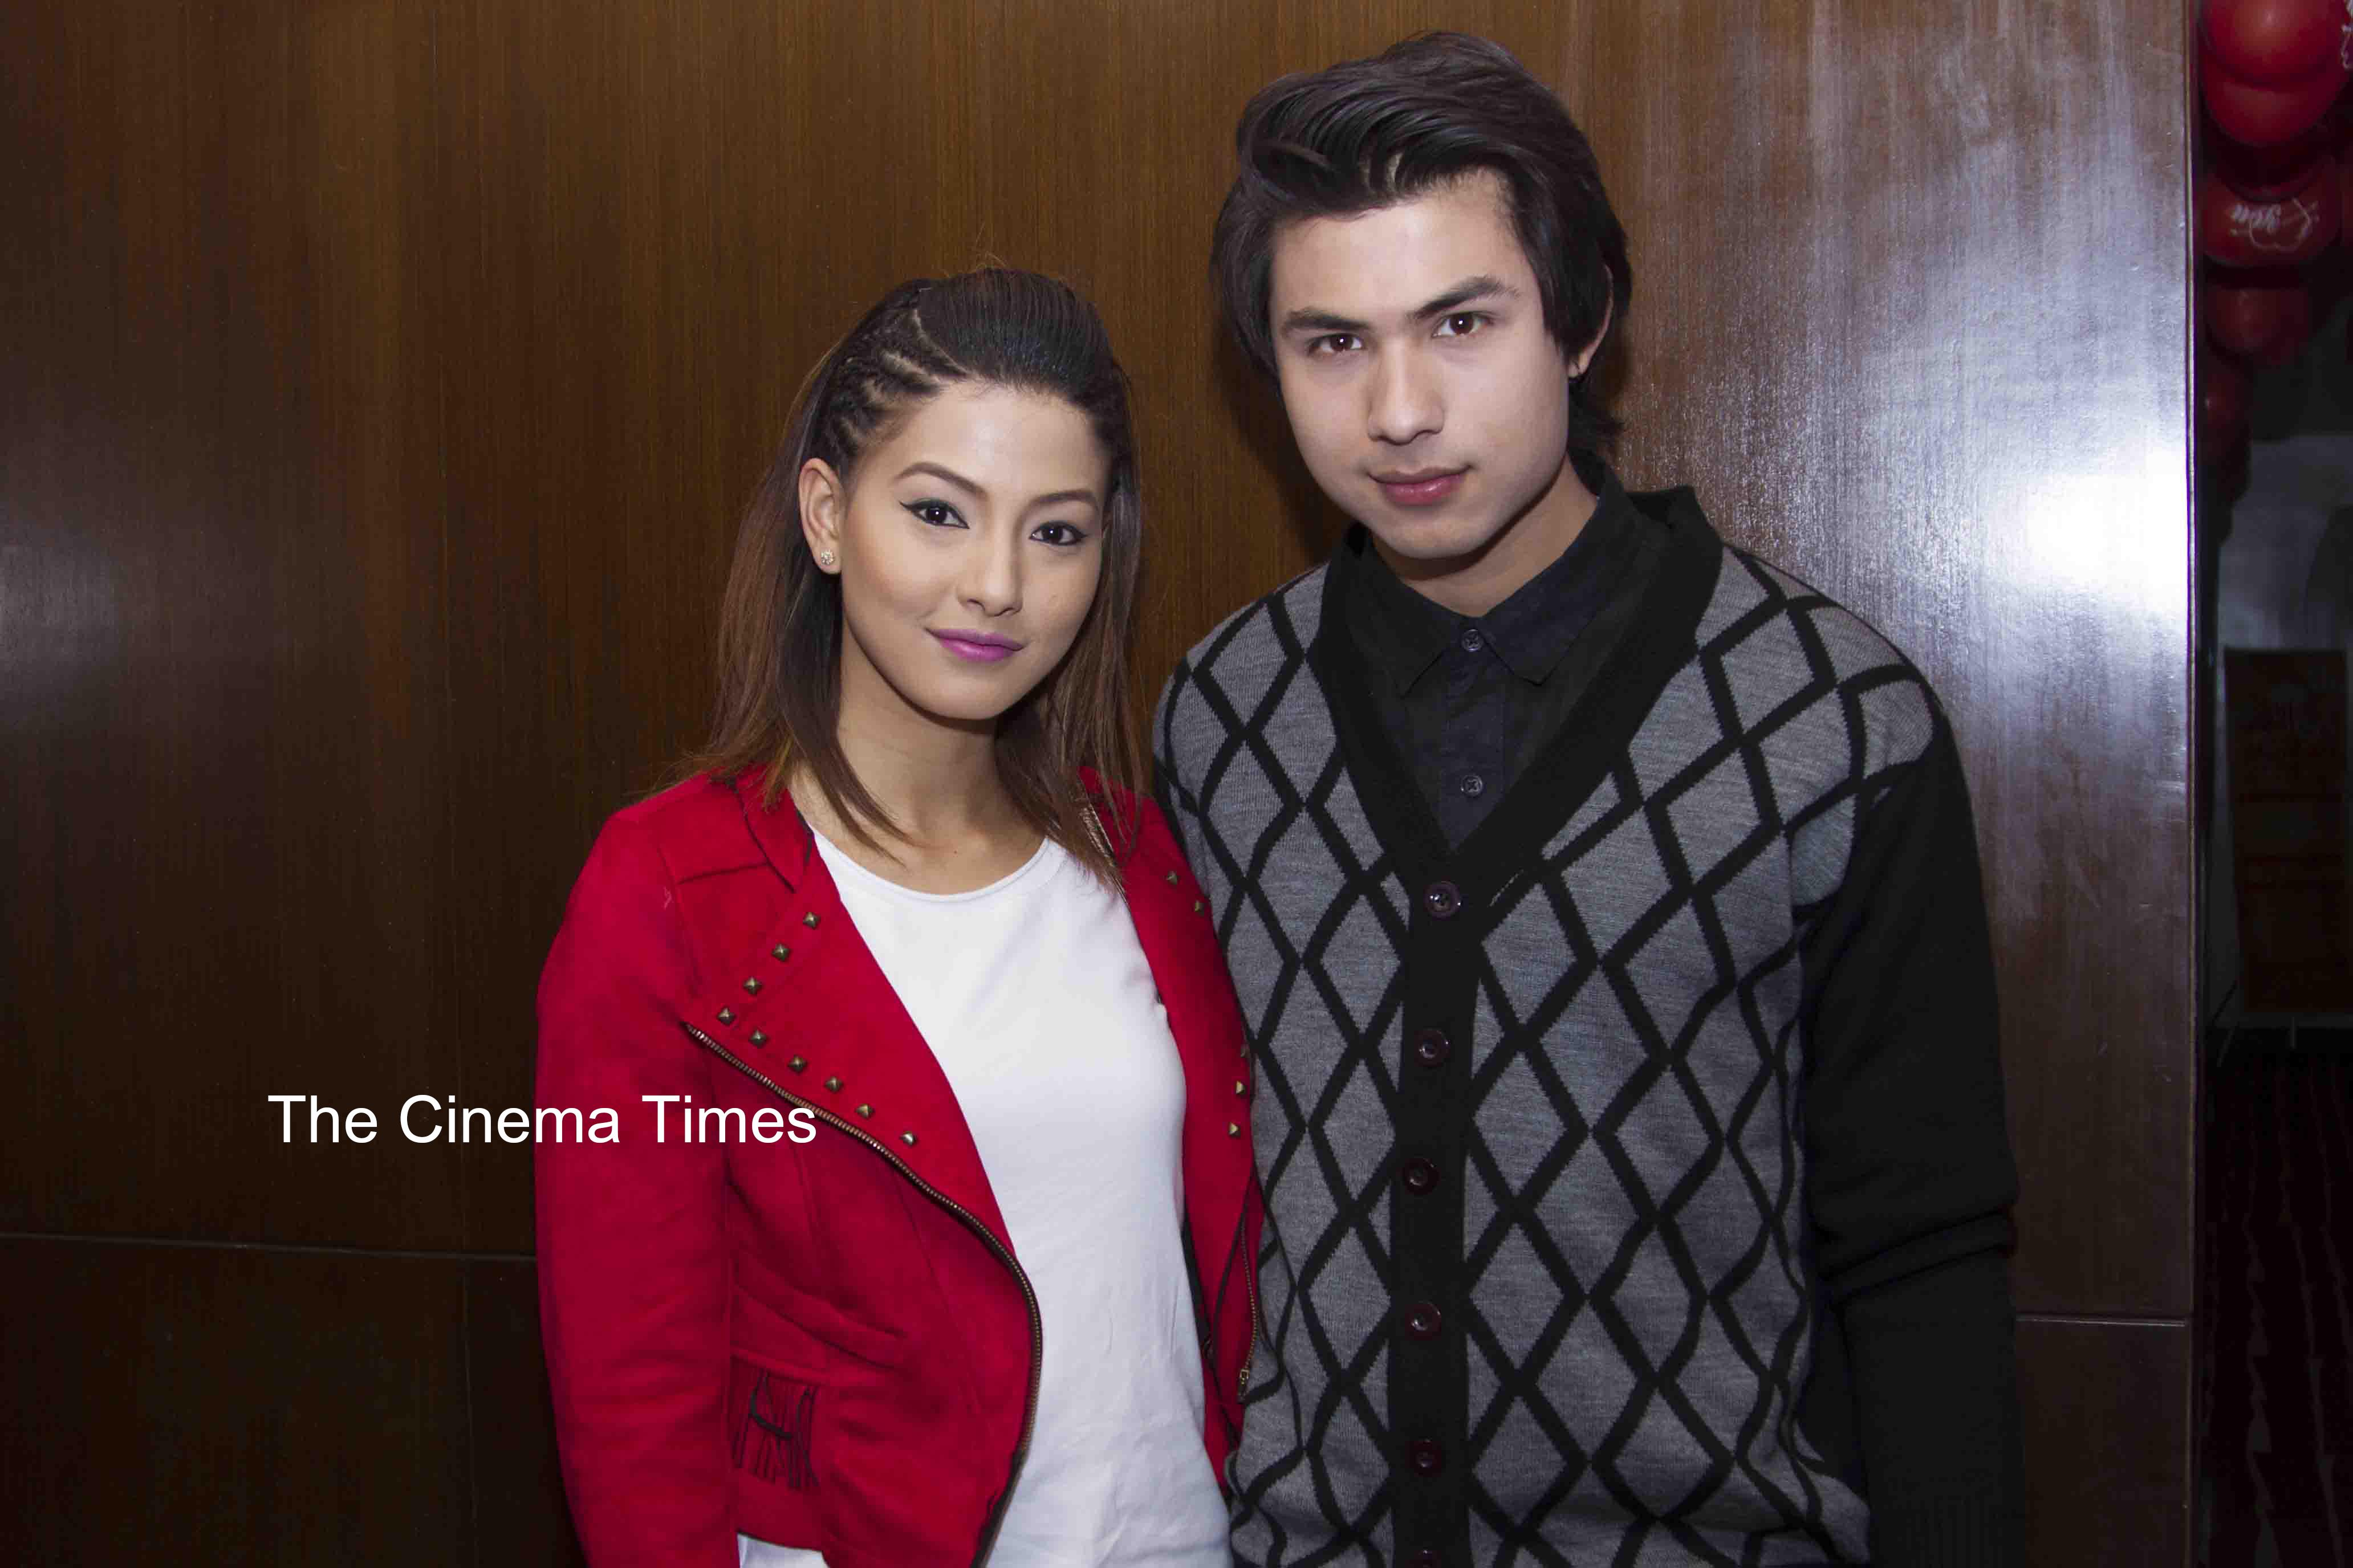 Anmol Kc and Samragyee Shah in Nepali cinema Dreams Bhuwan KC - The Cinema Times